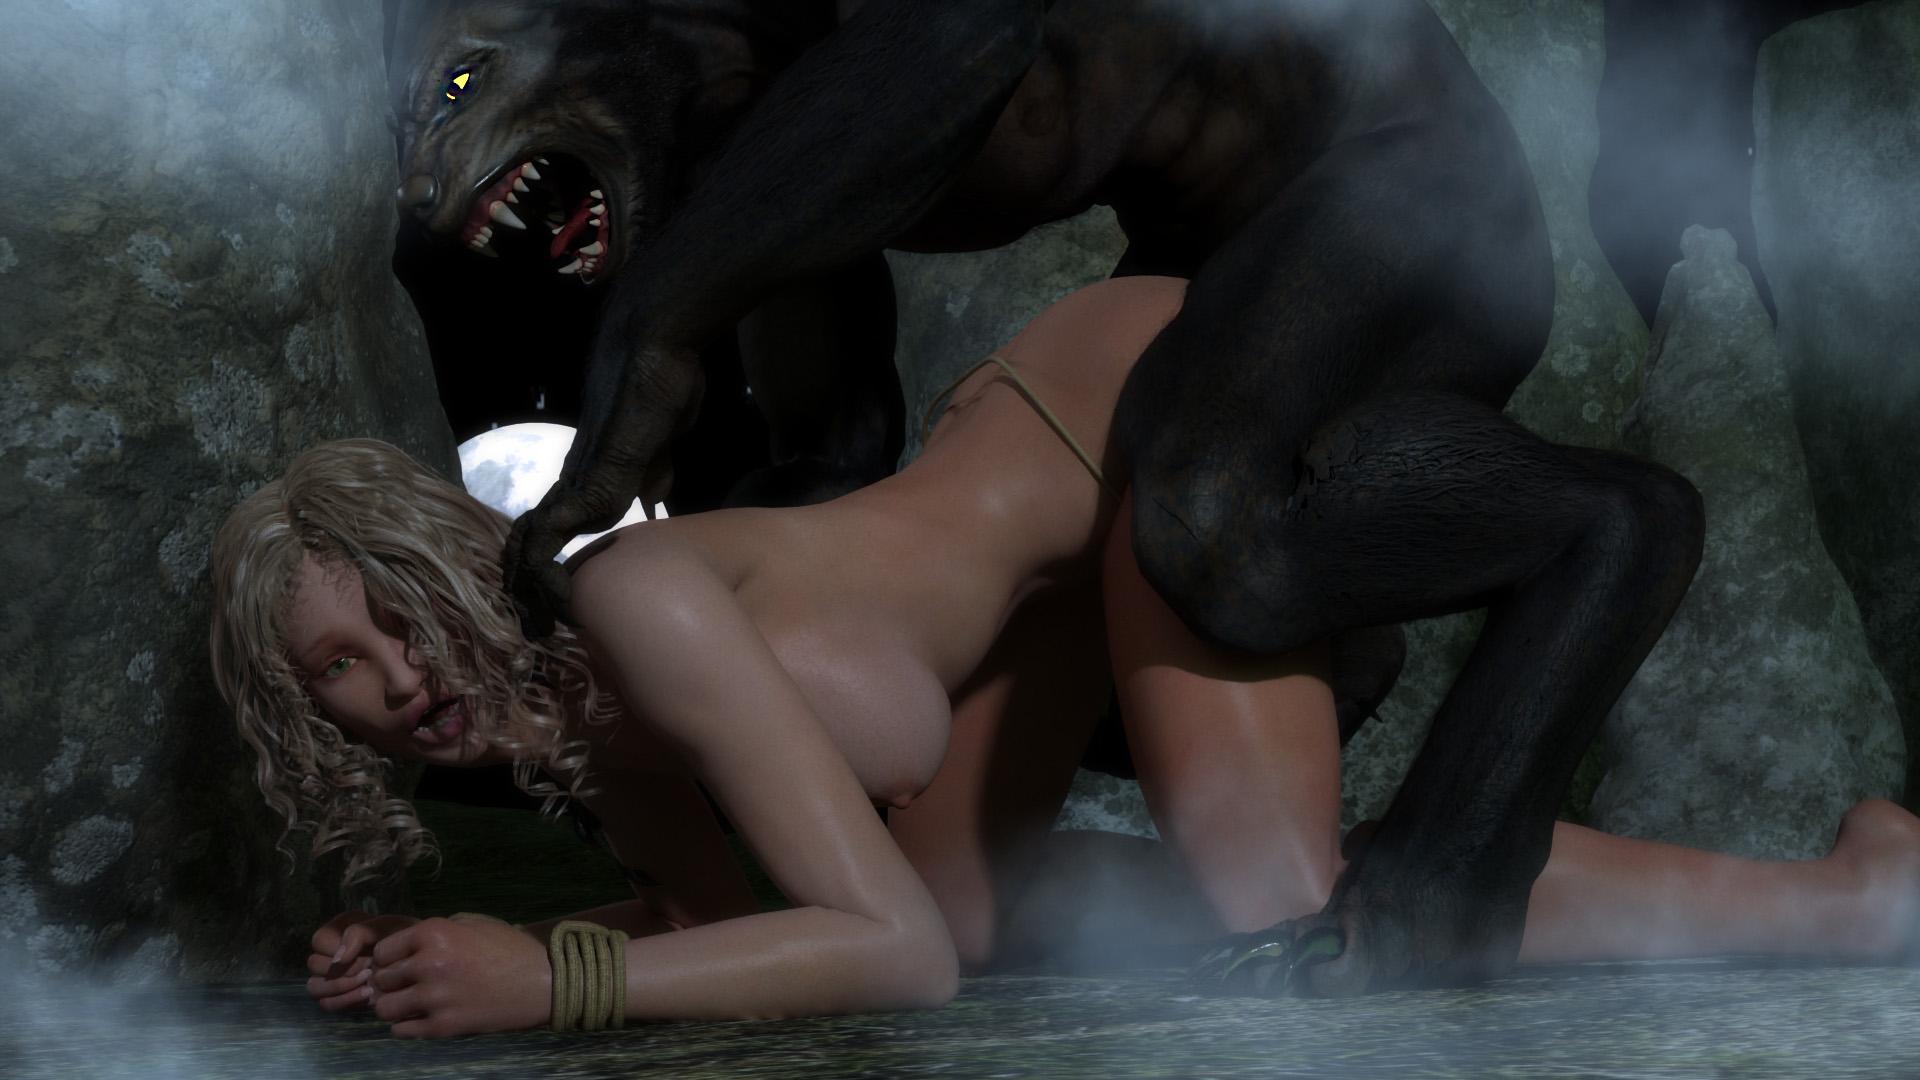 Секс с берковой berkova scene from laced lt loaded 32003 порно видео